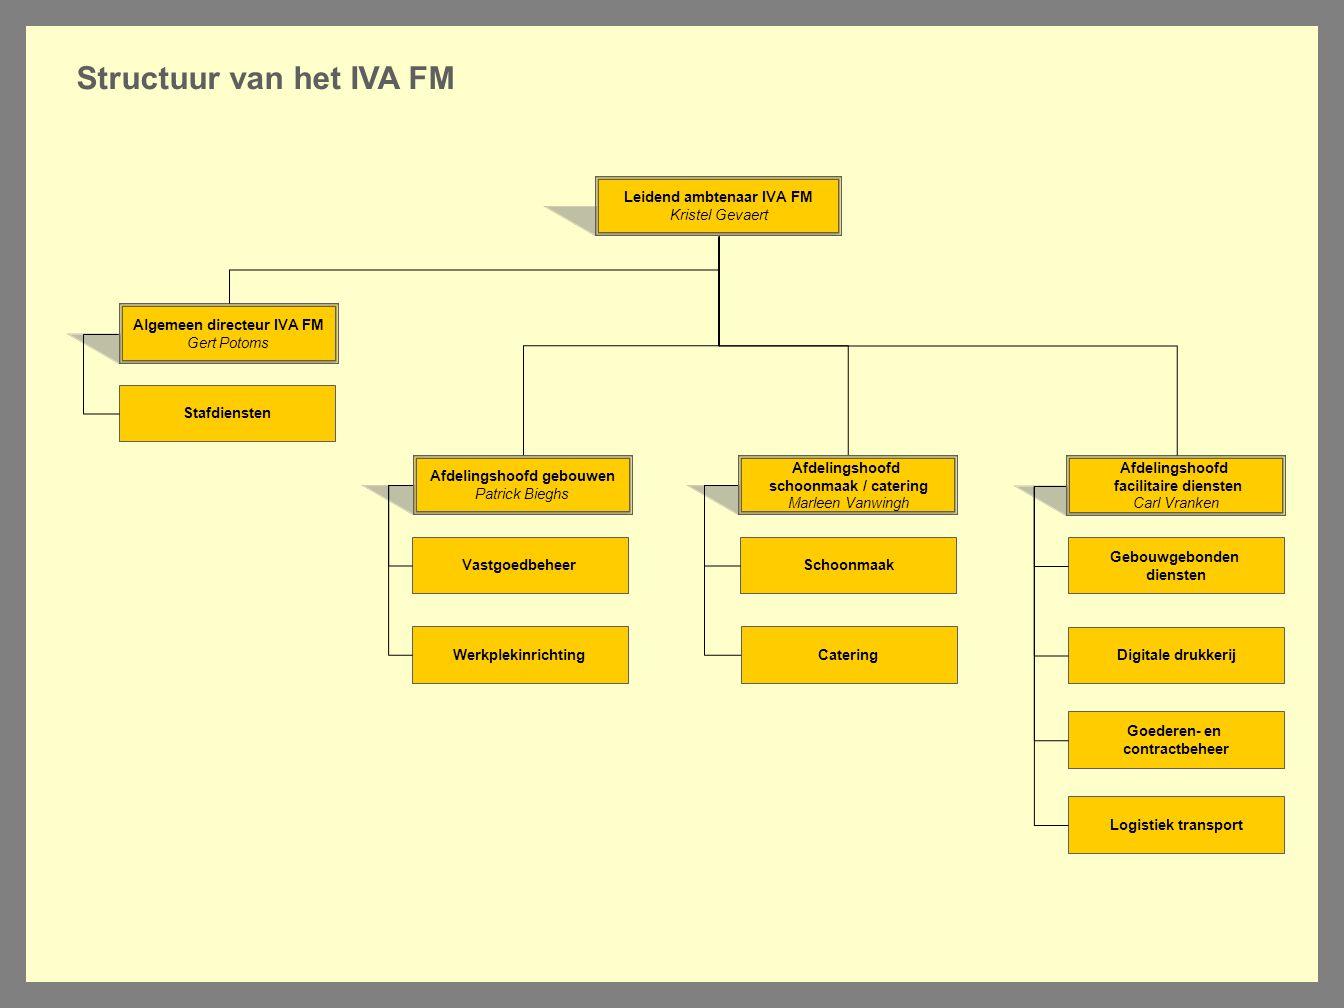 Structuur van het IVA FM Leidend ambtenaar IVA FM Kristel Gevaert Afdelingshoofd gebouwen Patrick Bieghs Werkplekinrichting Afdelingshoofd schoonmaak